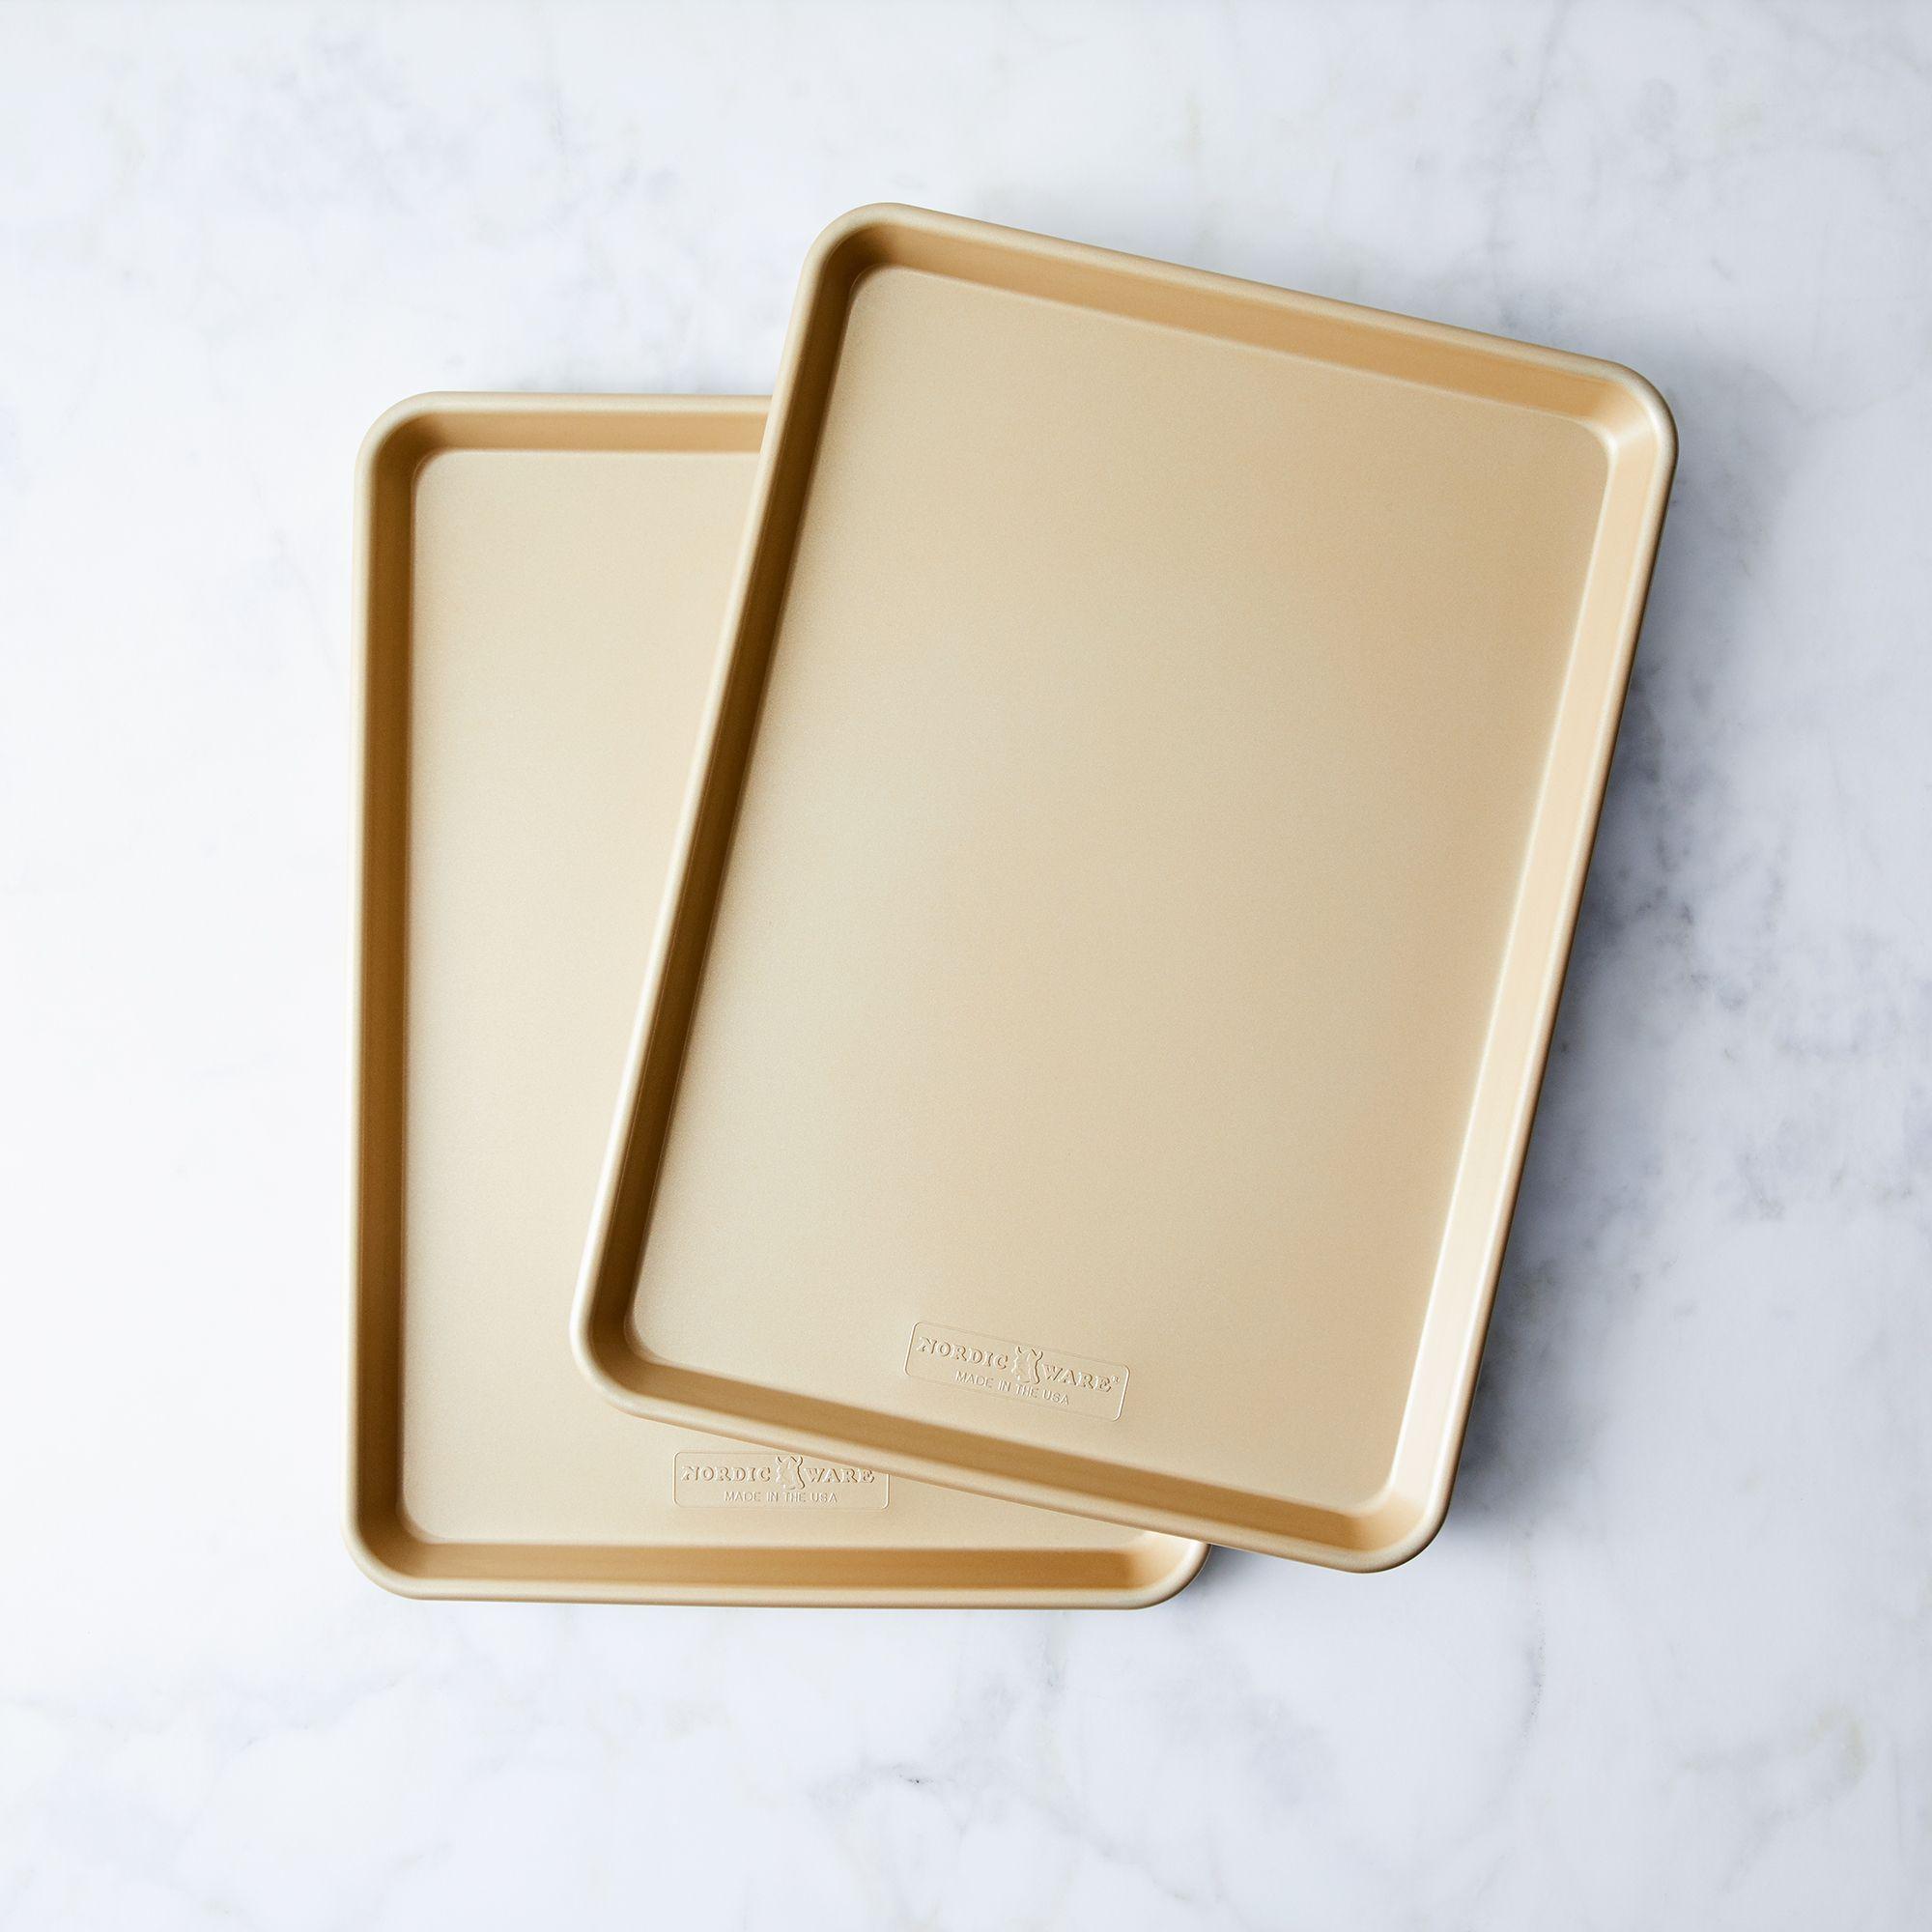 Nordic Ware Gold Nonstick Baking Sheet Sets - Half Sheets (Set of 2)